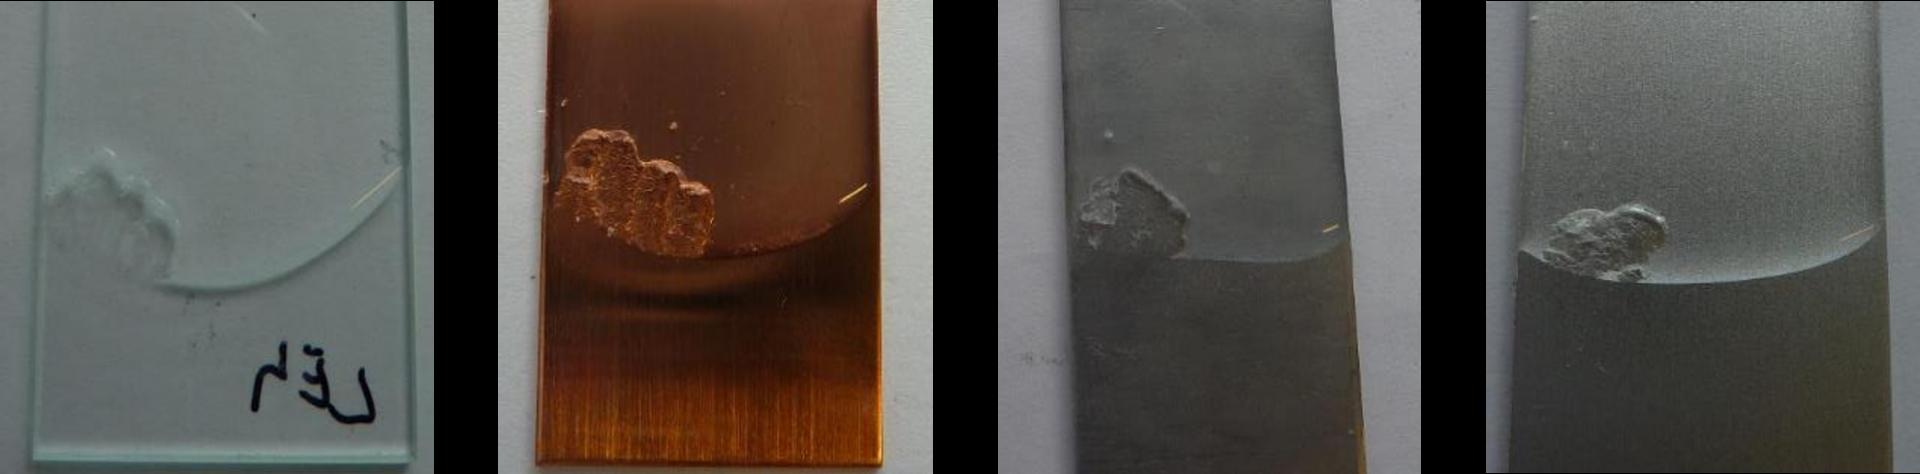 Self Adhesive Dowsil EI2888